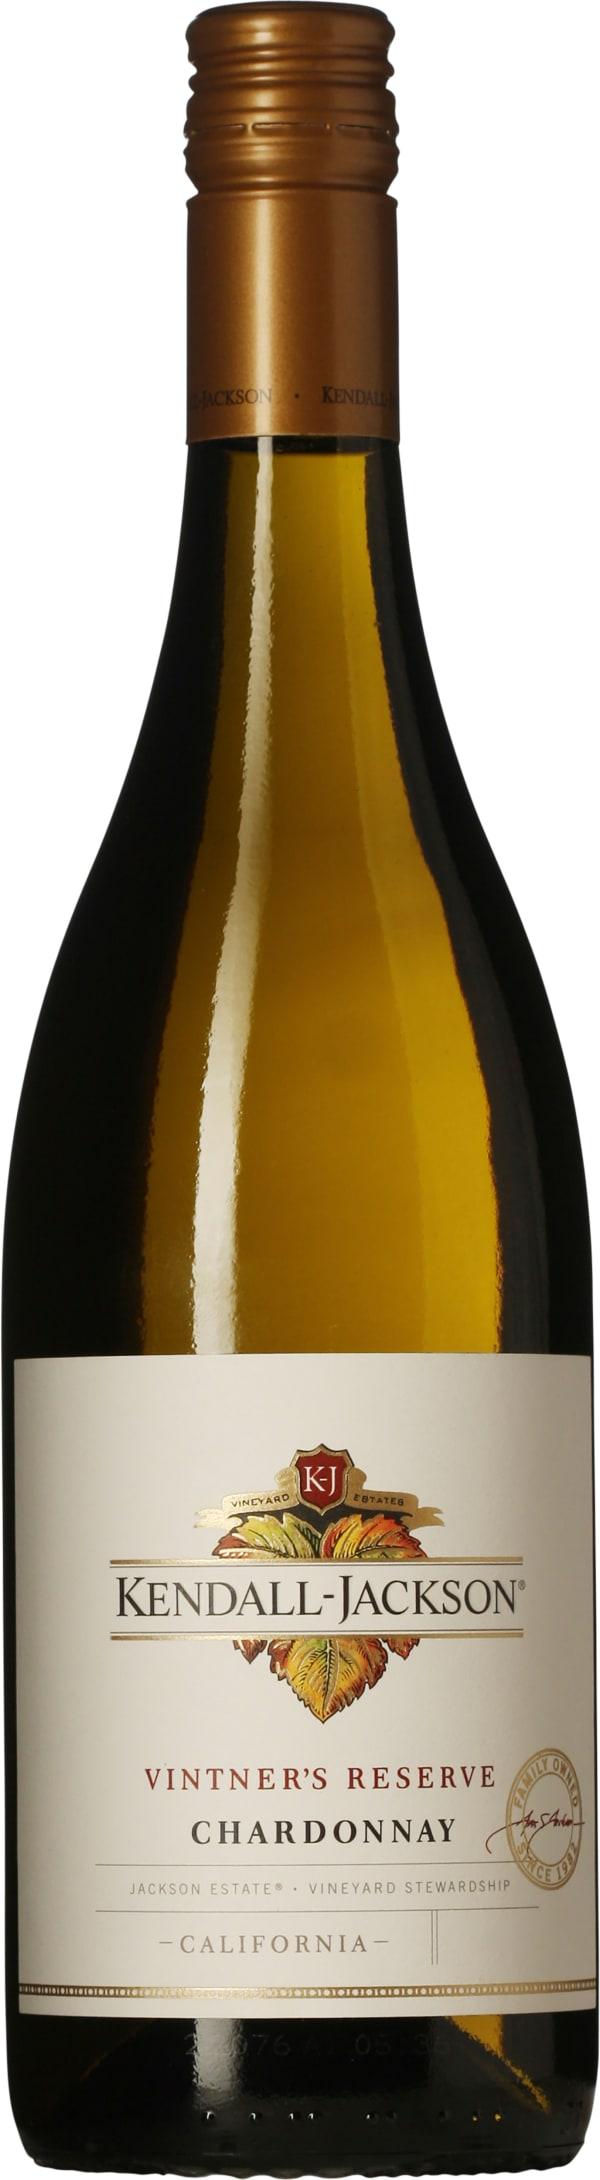 Kendall Jackson Vintner's Reserve Chardonnay 2017